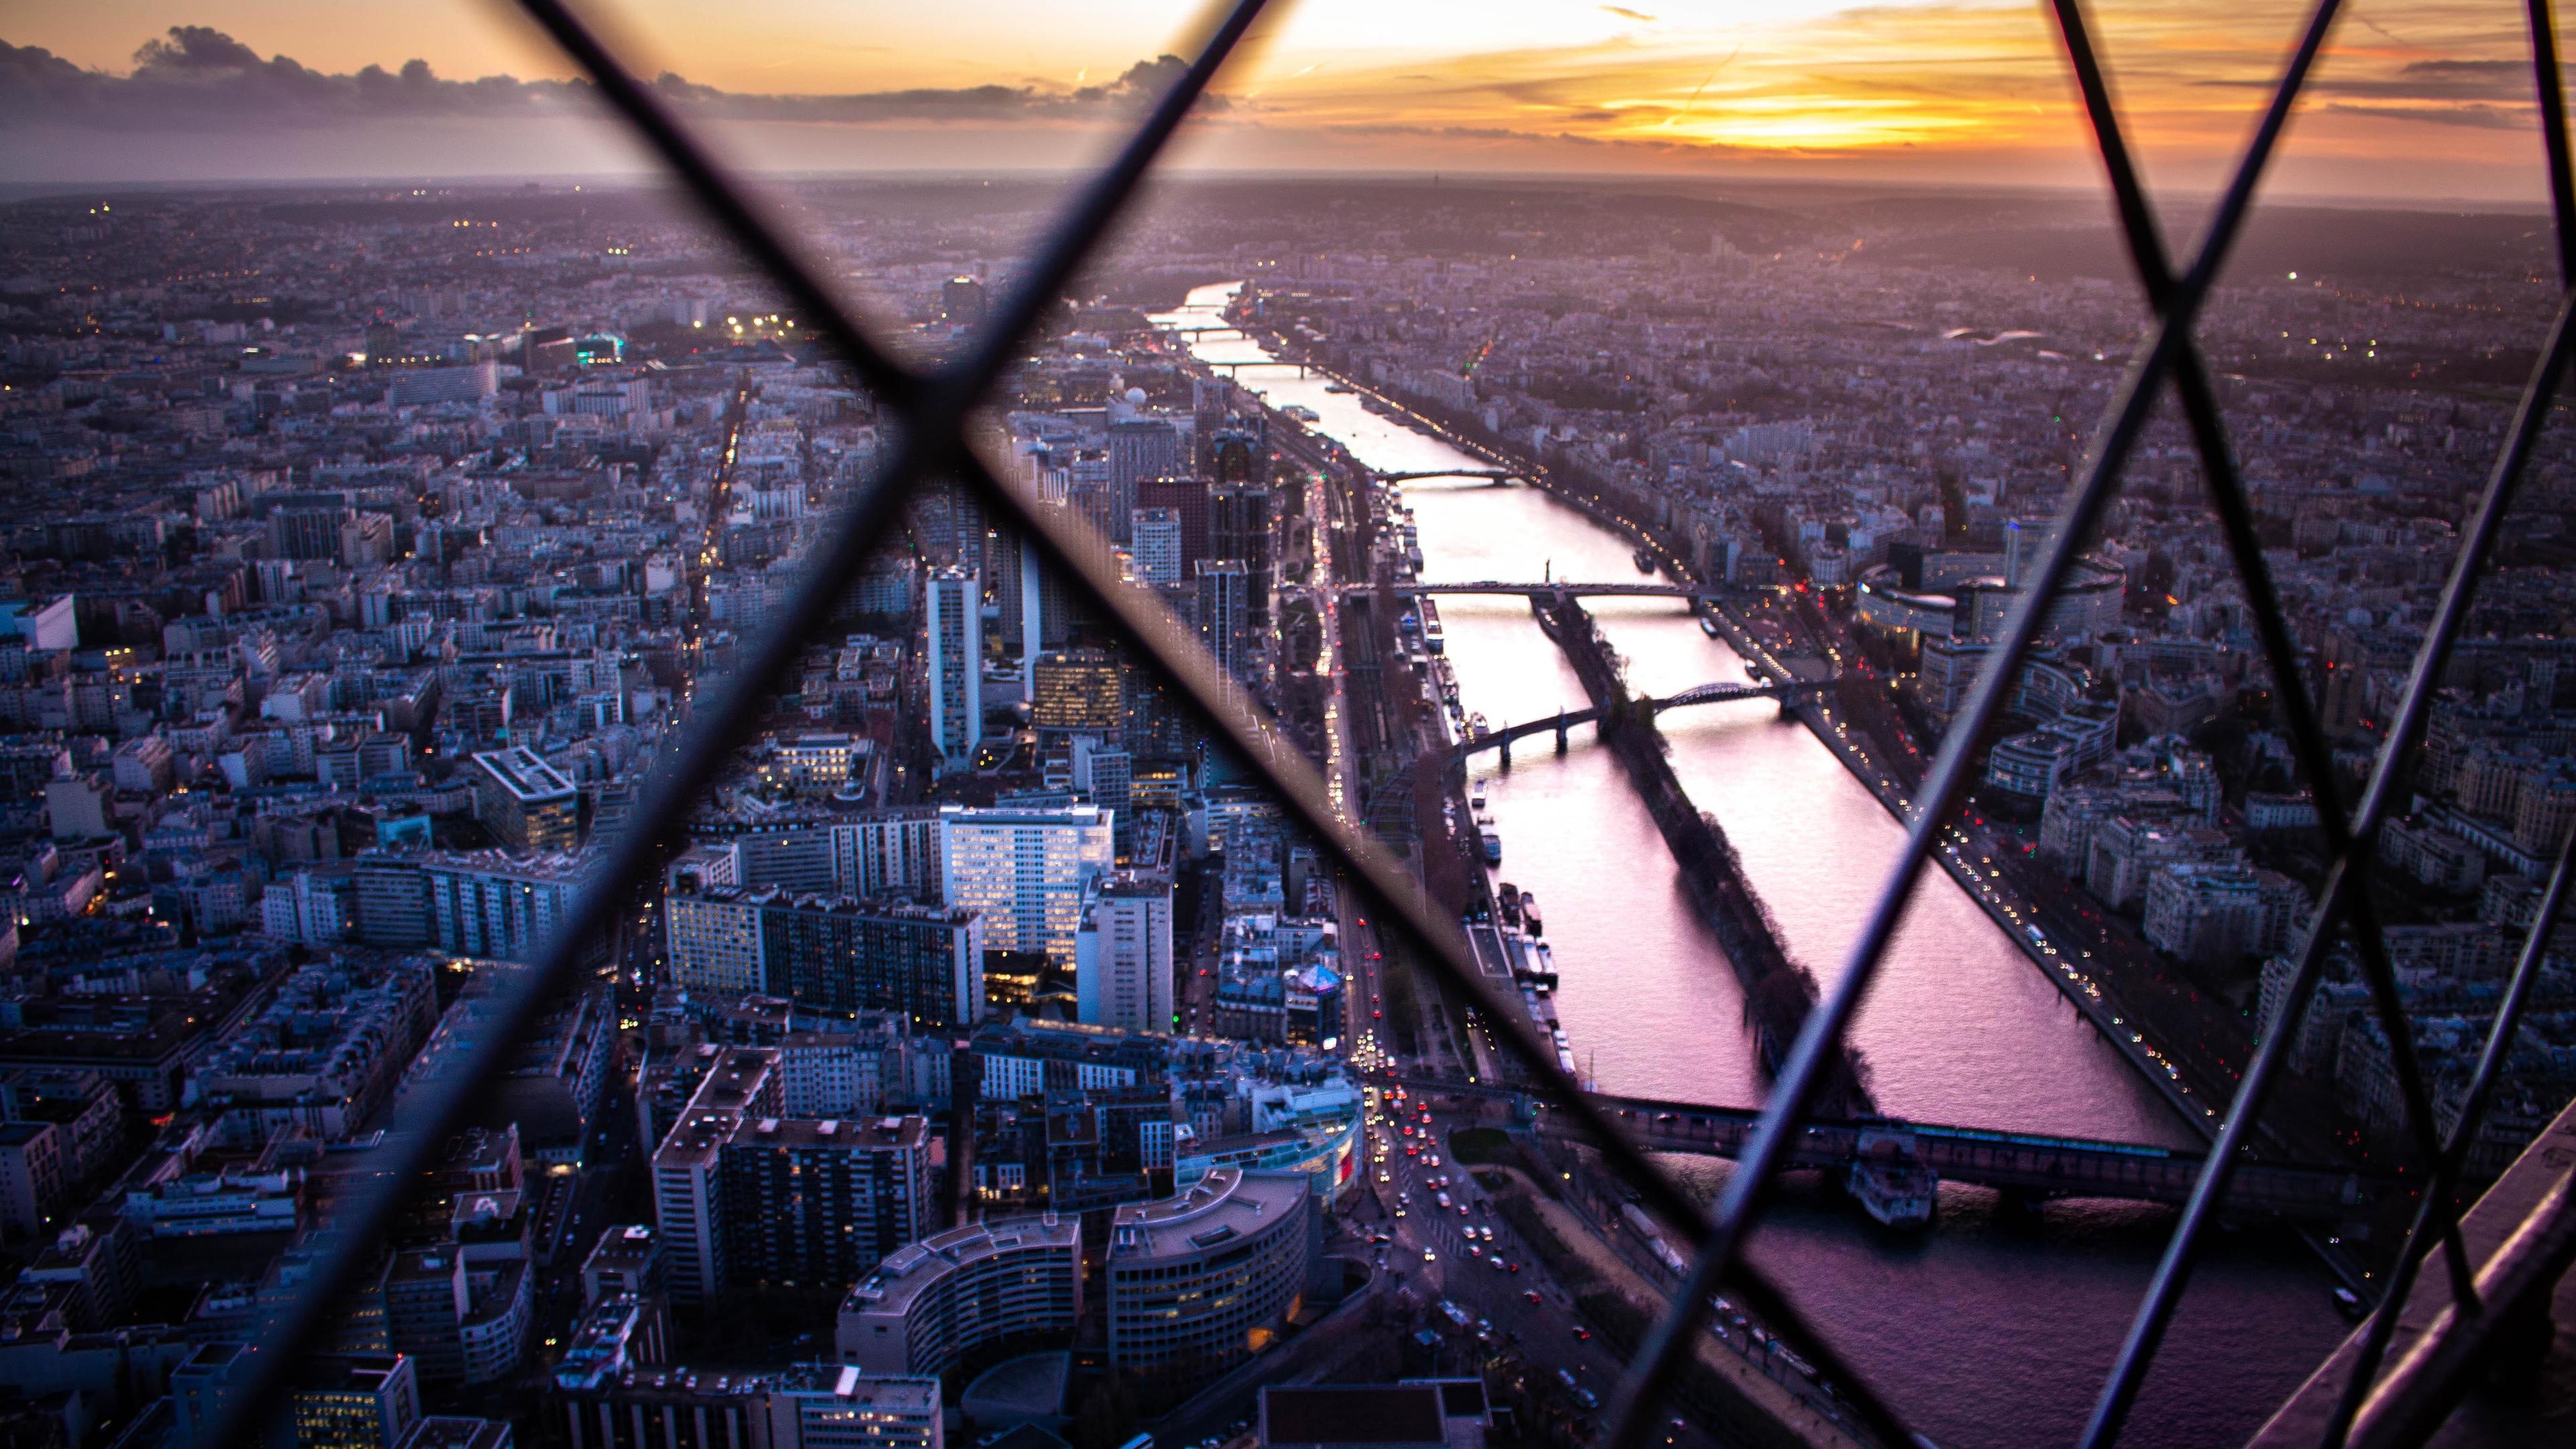 Hd Wallpaper Paris Posted By John Walker